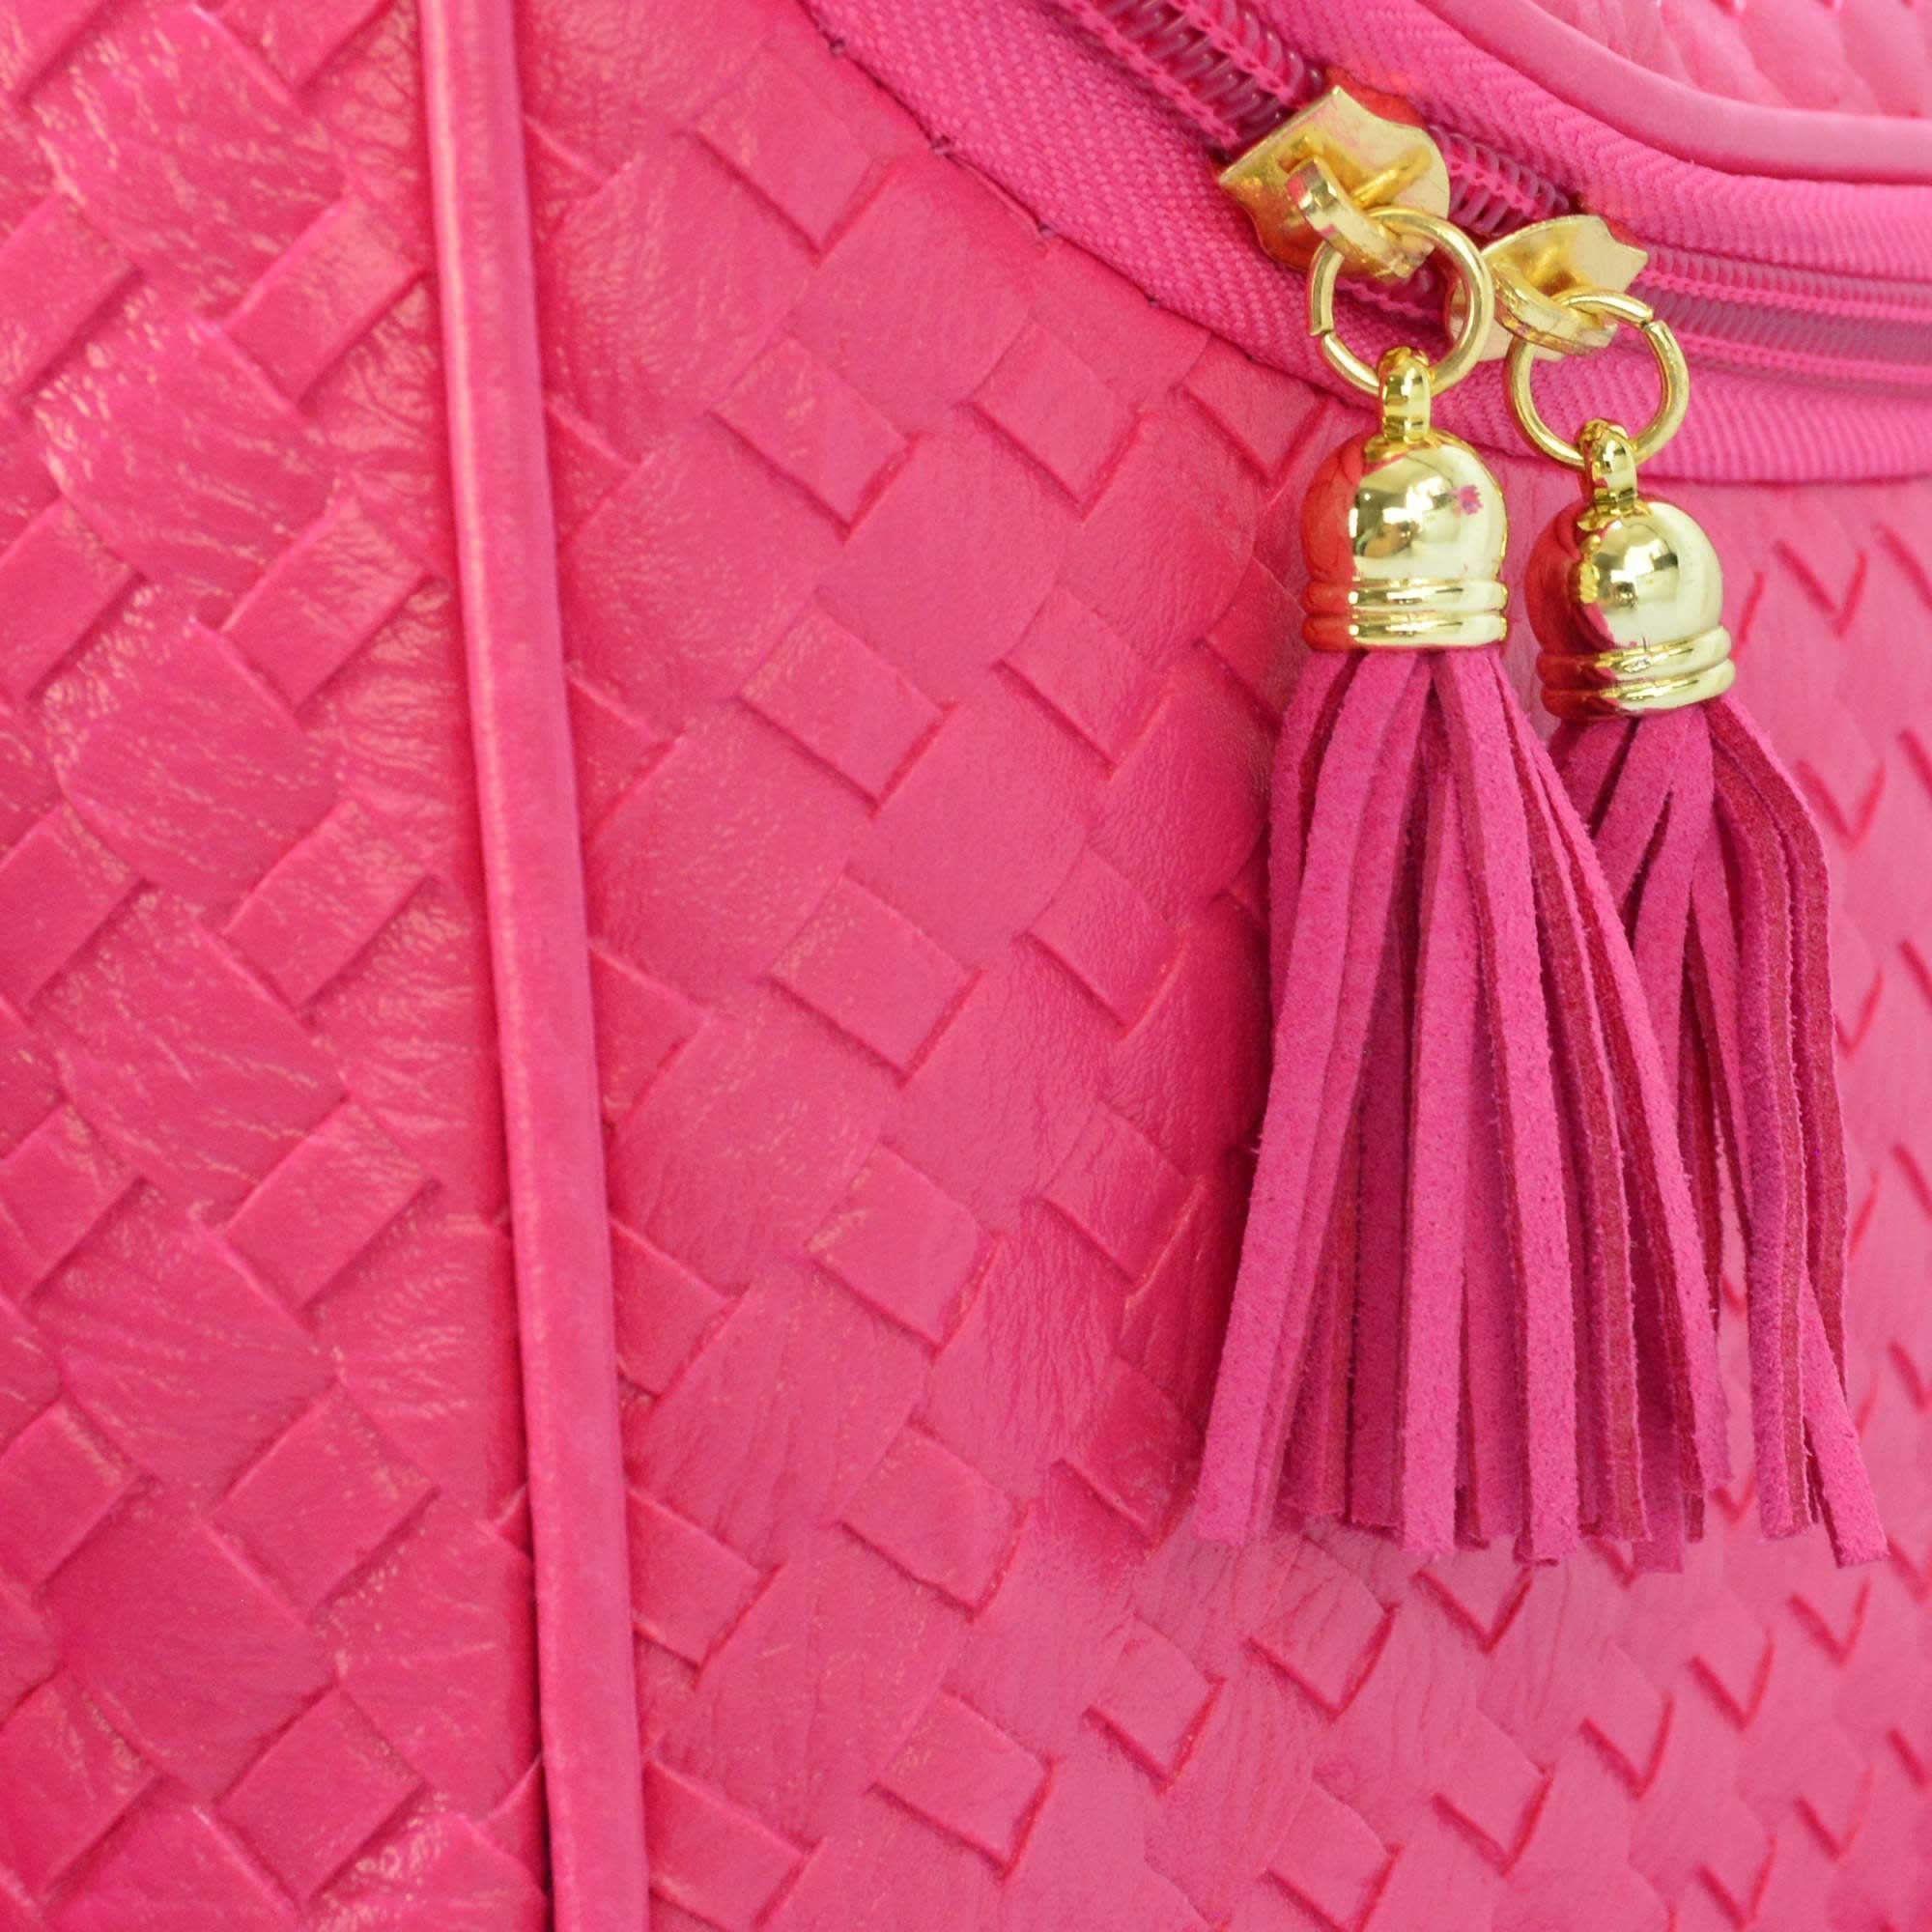 Nécessaire Feminina Bolsa Térmica Luxo Pink CBRN07981